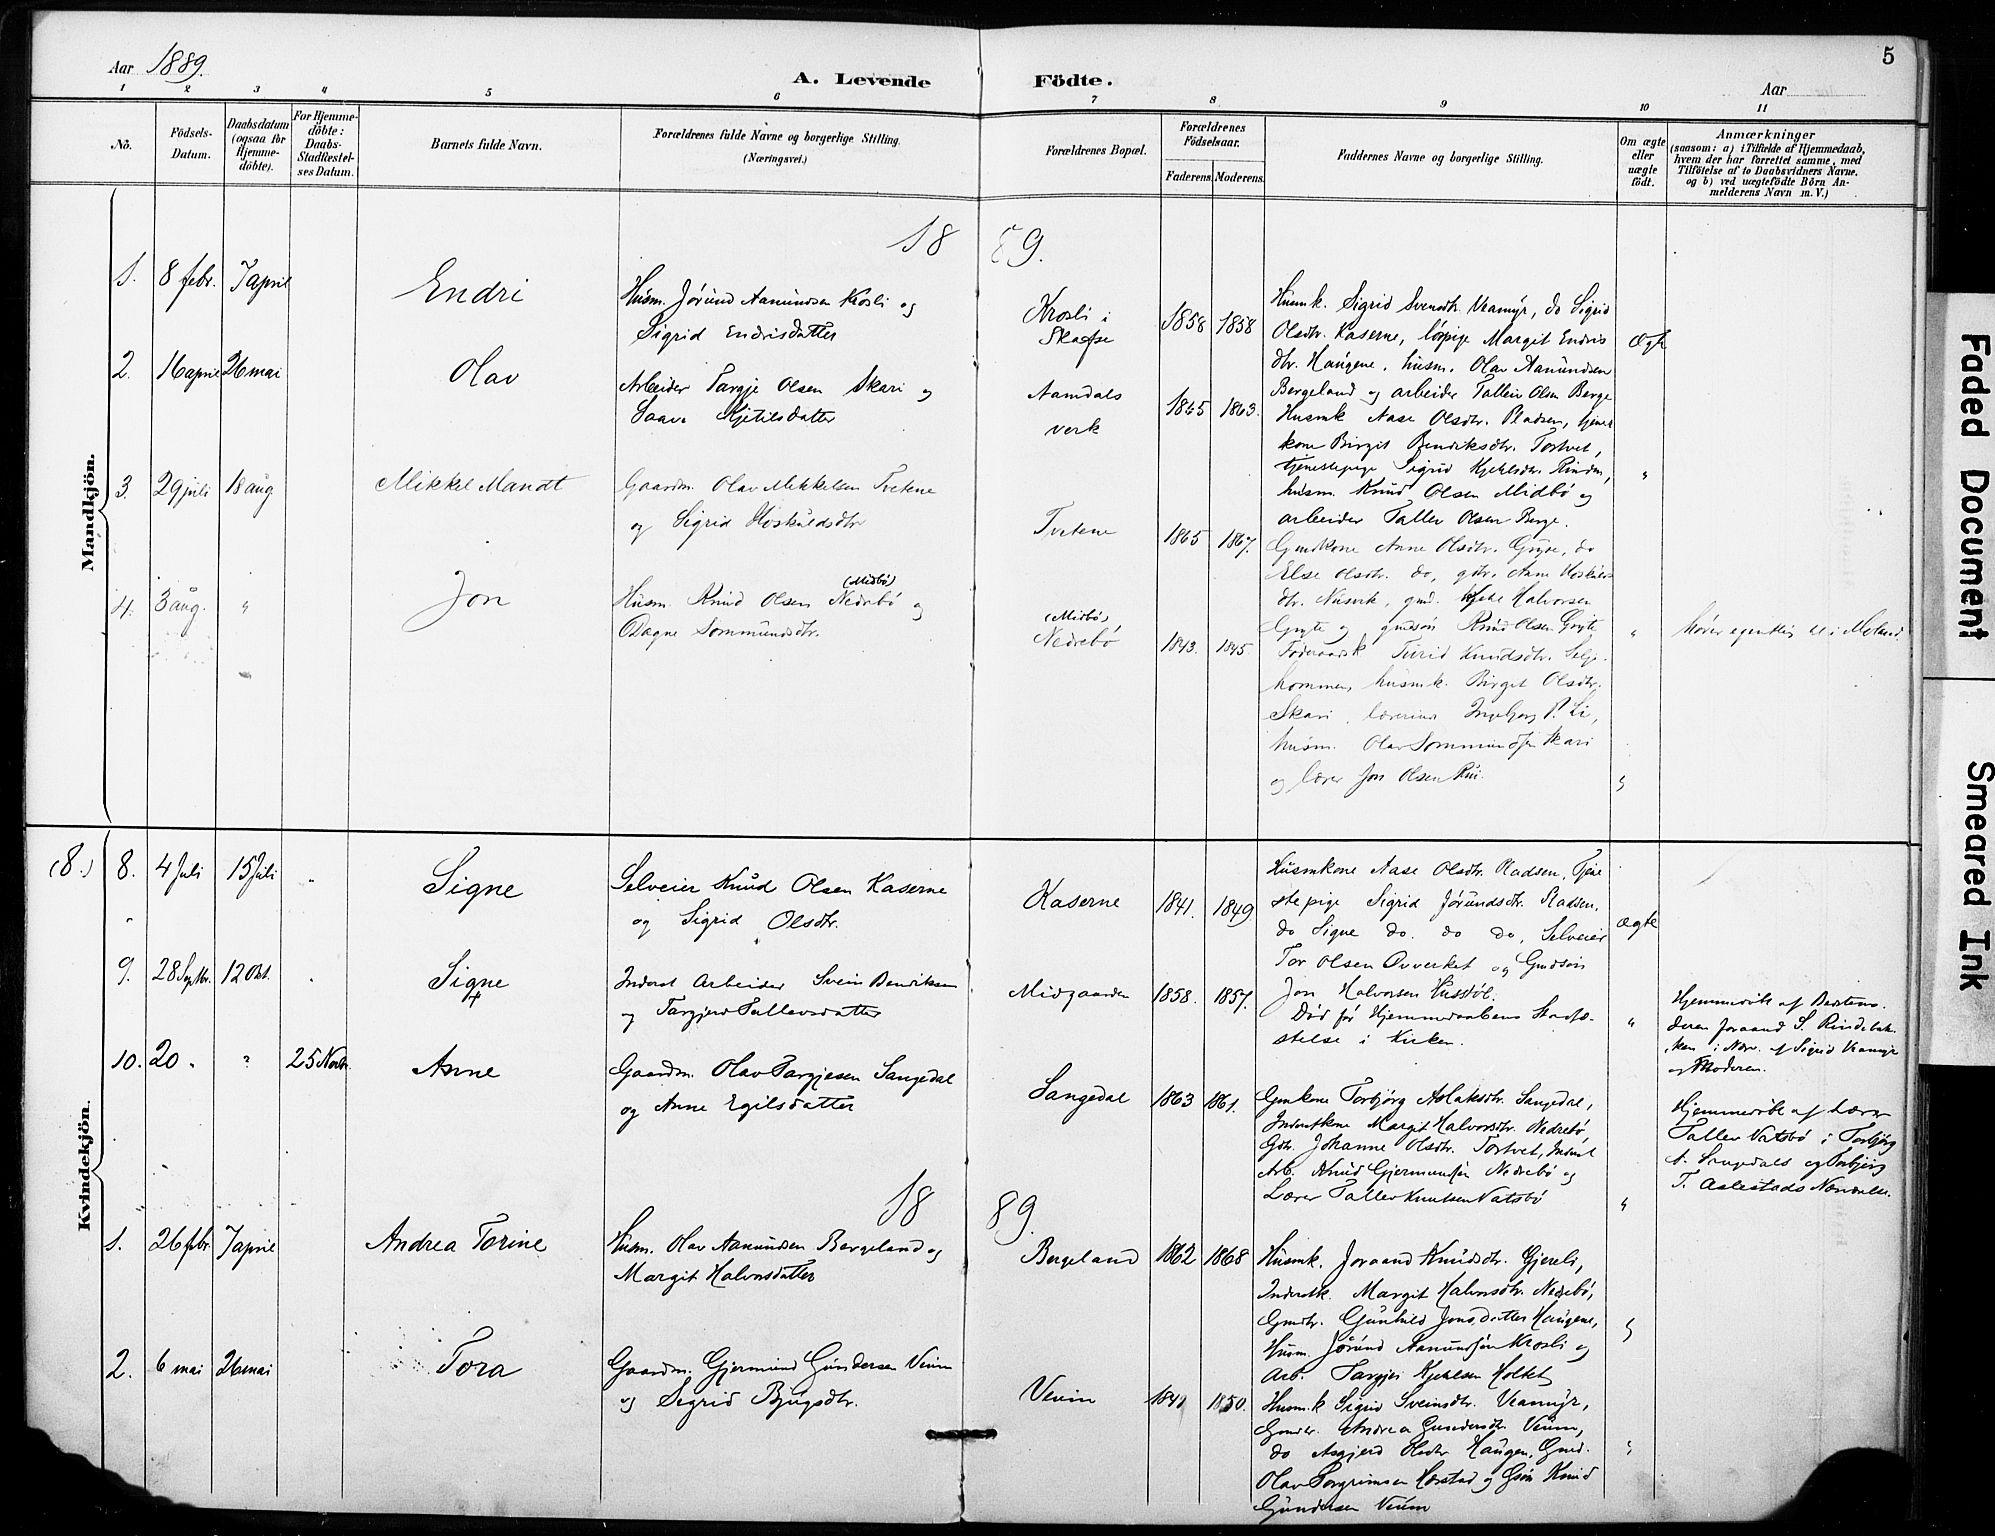 SAKO, Fyresdal kirkebøker, F/Fb/L0003: Ministerialbok nr. II 3, 1887-1903, s. 5